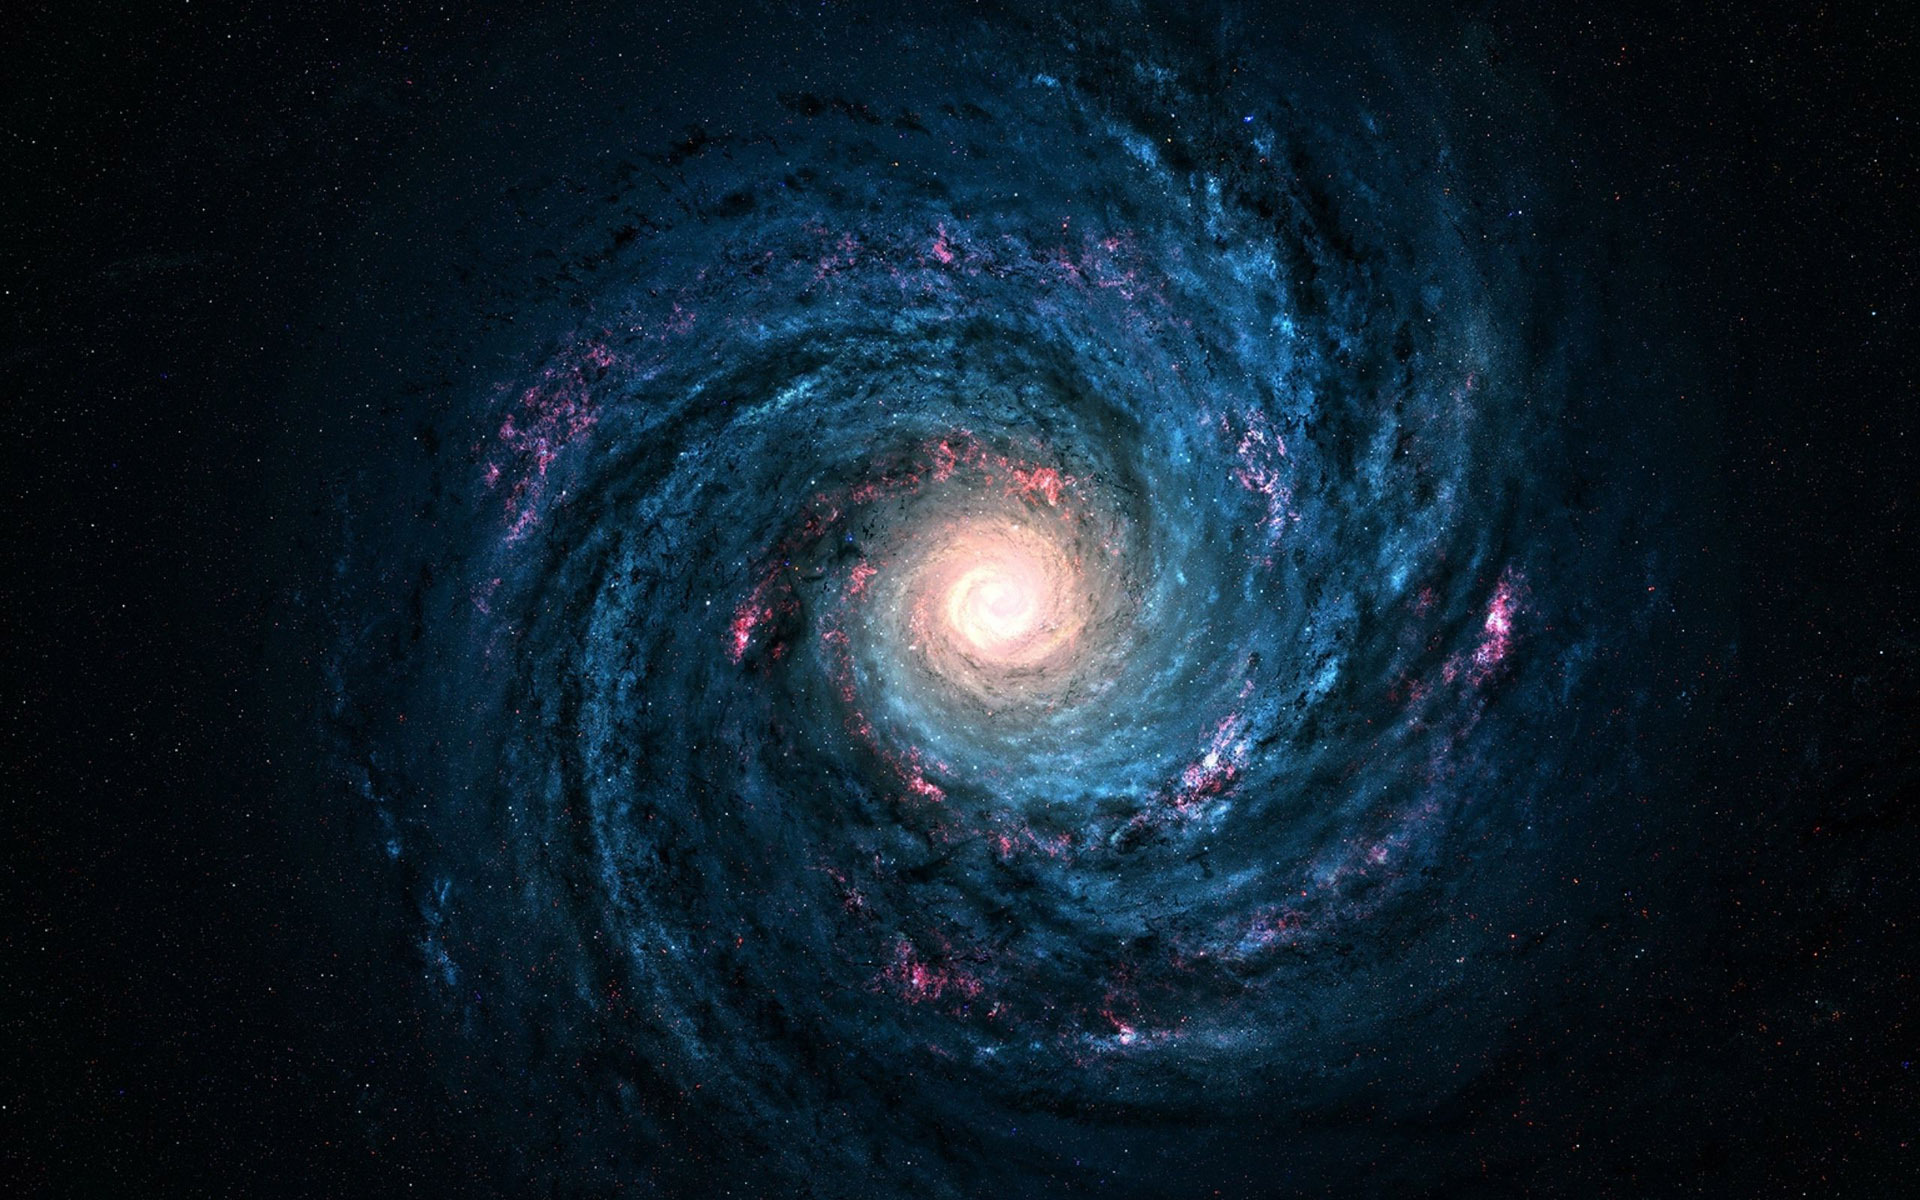 72 Milky Way Wallpapers On Wallpapersafari